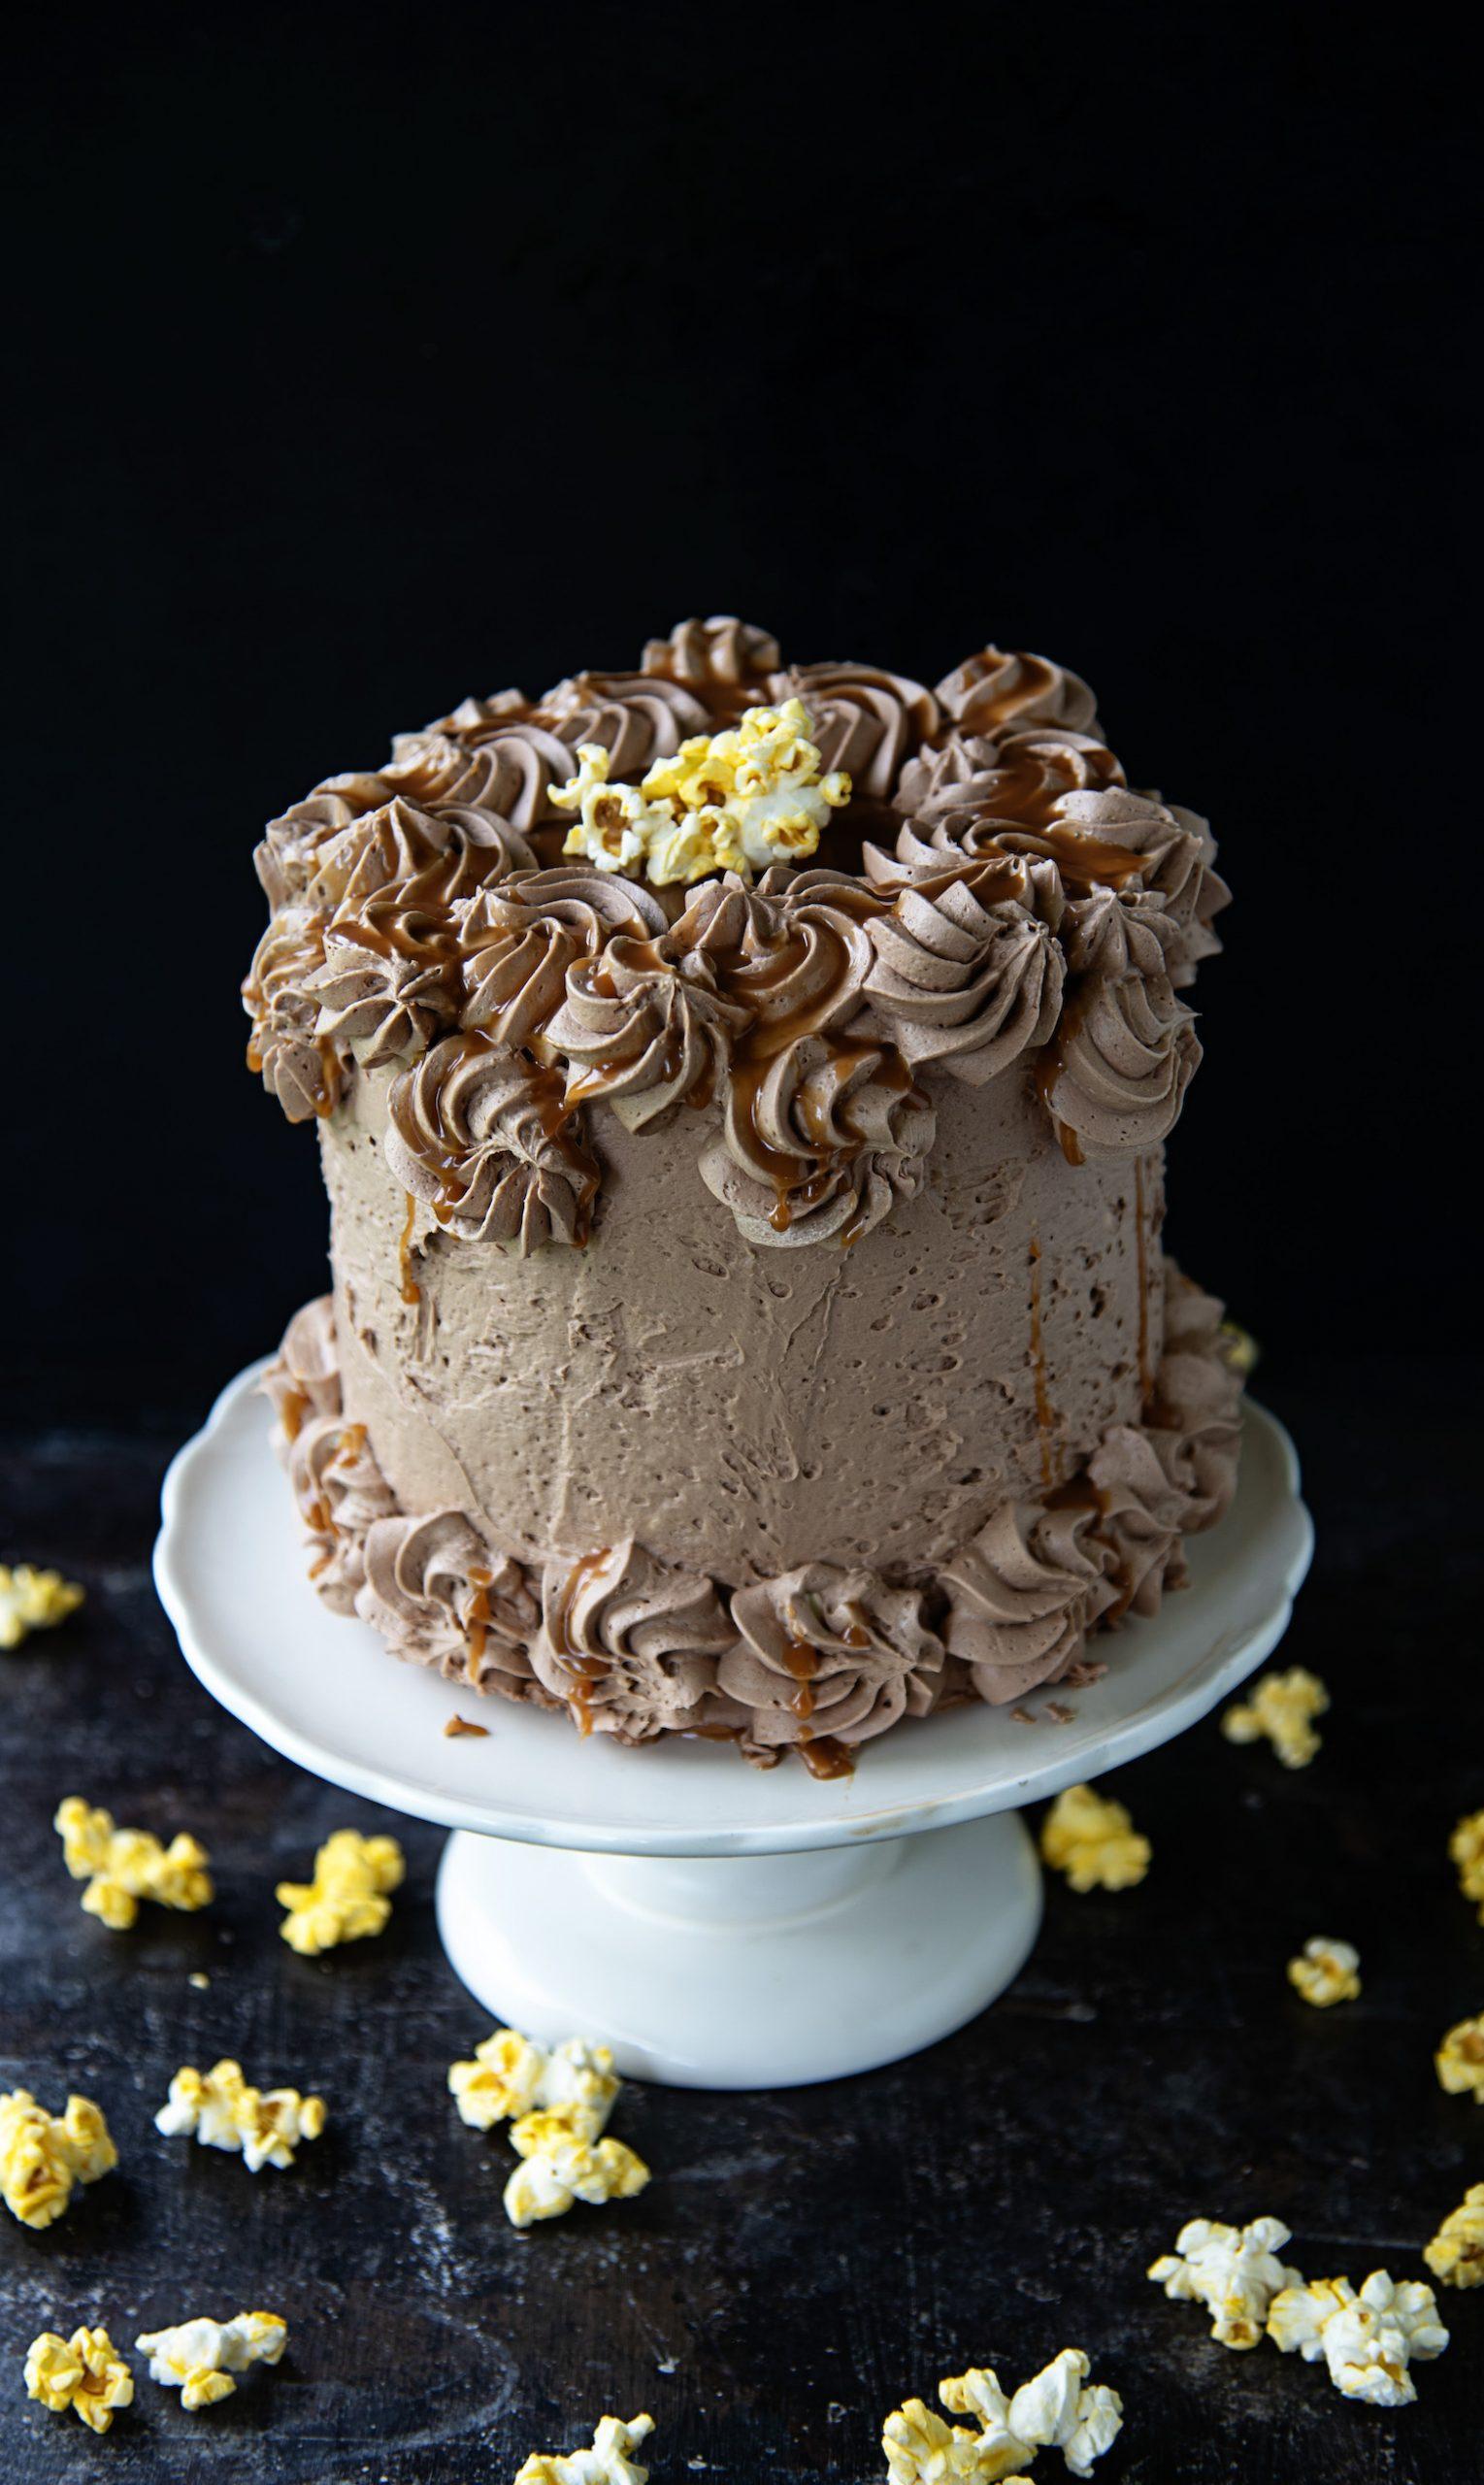 Chocolate Salted Caramel Popcorn Cake